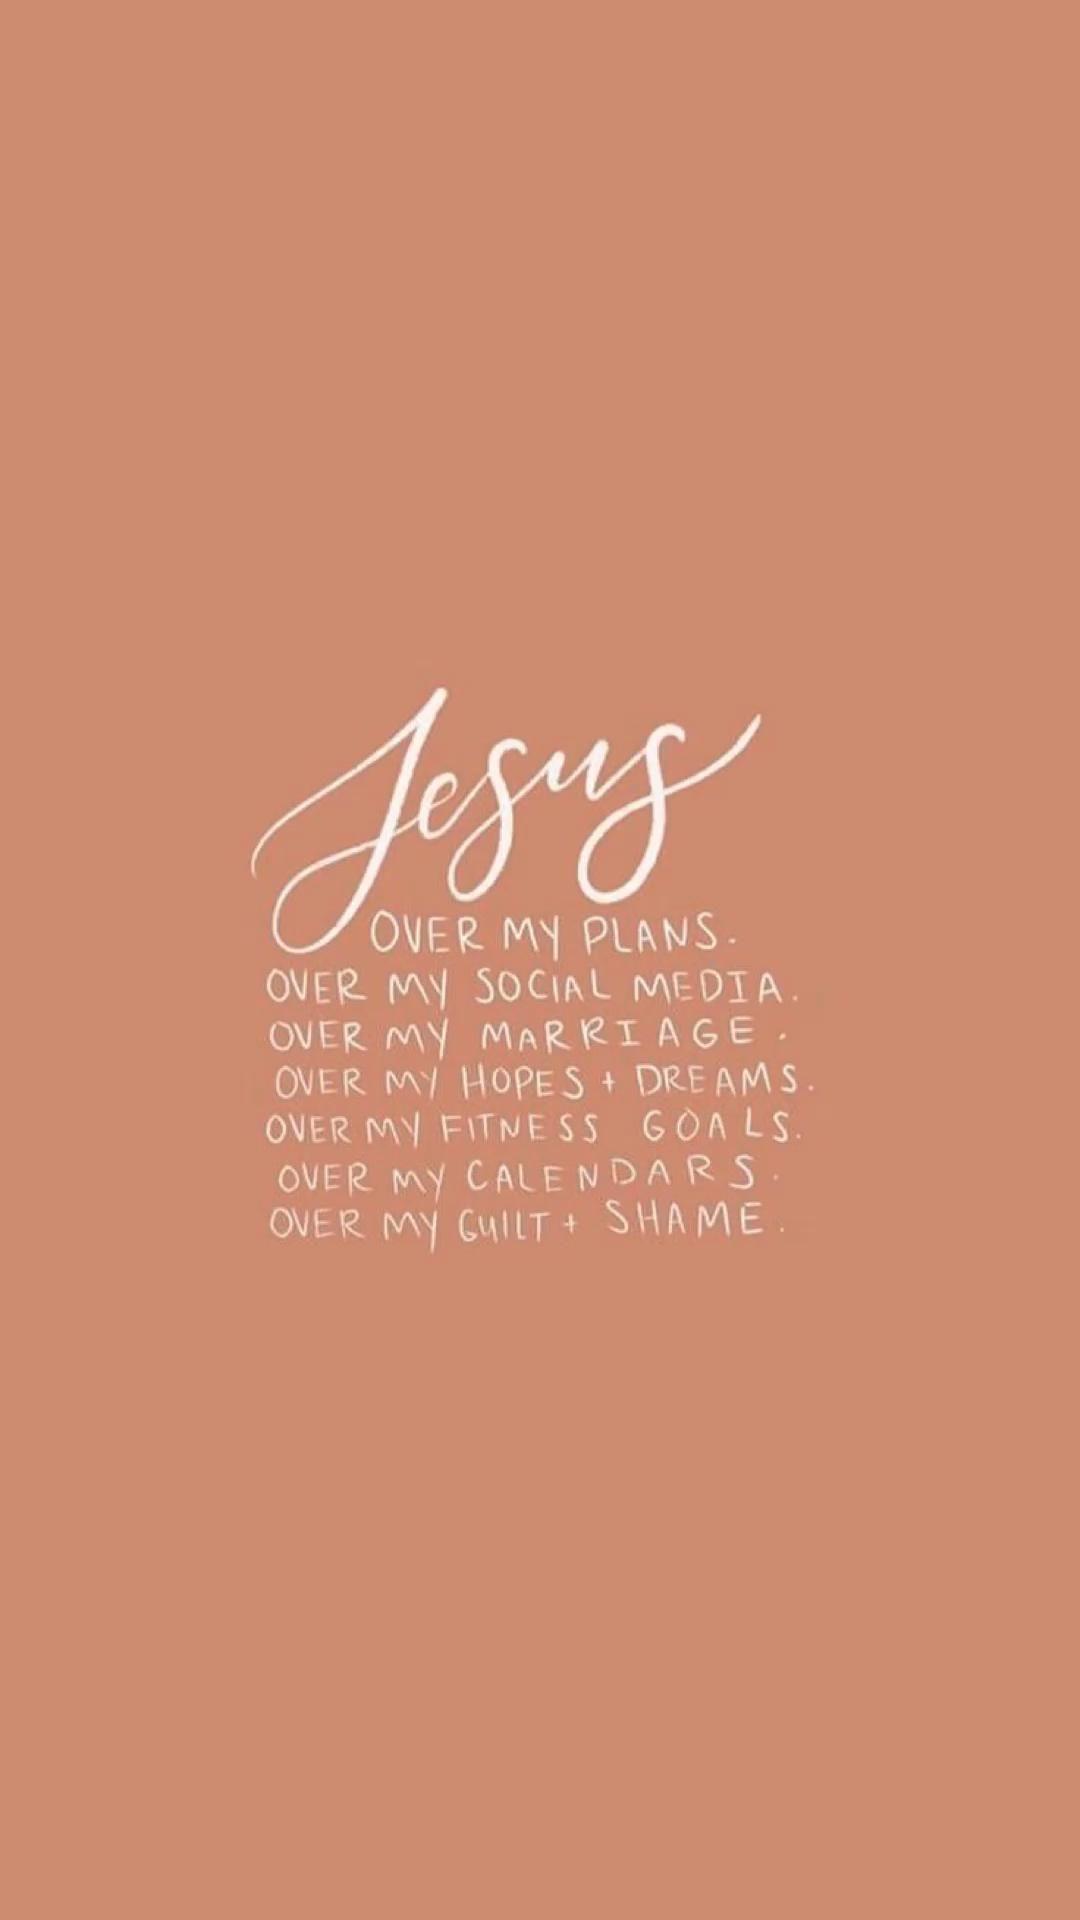 Jesus quotes              ✨🤍⚡️🌼